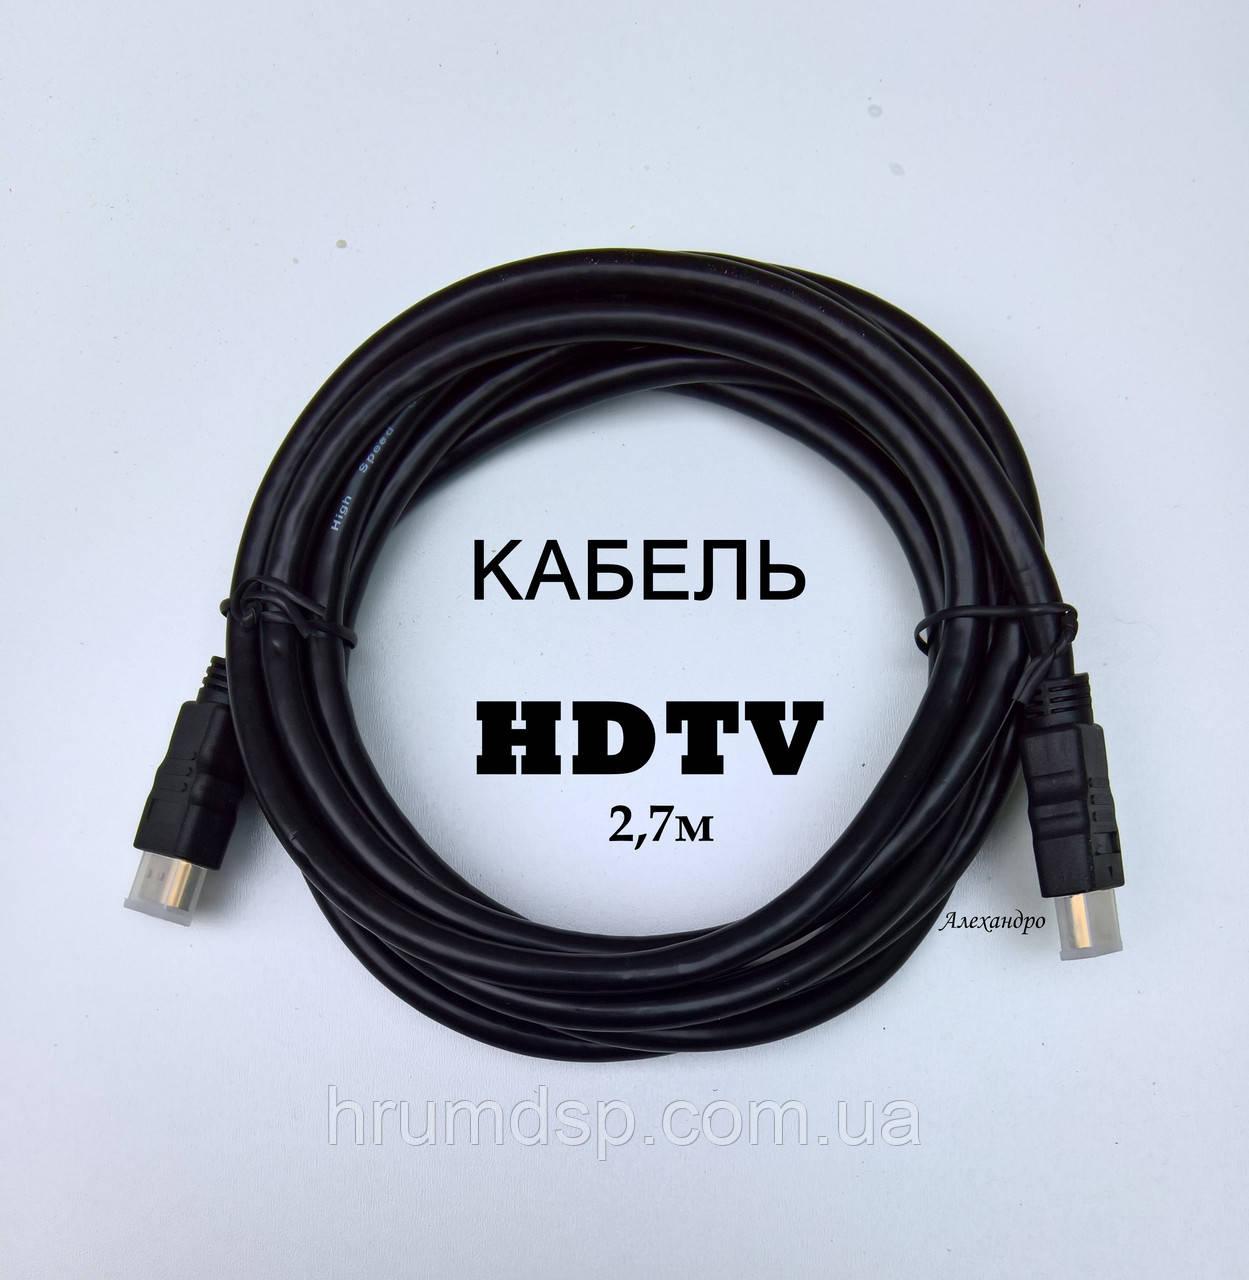 Кабель видео HDMI (2,7 м)